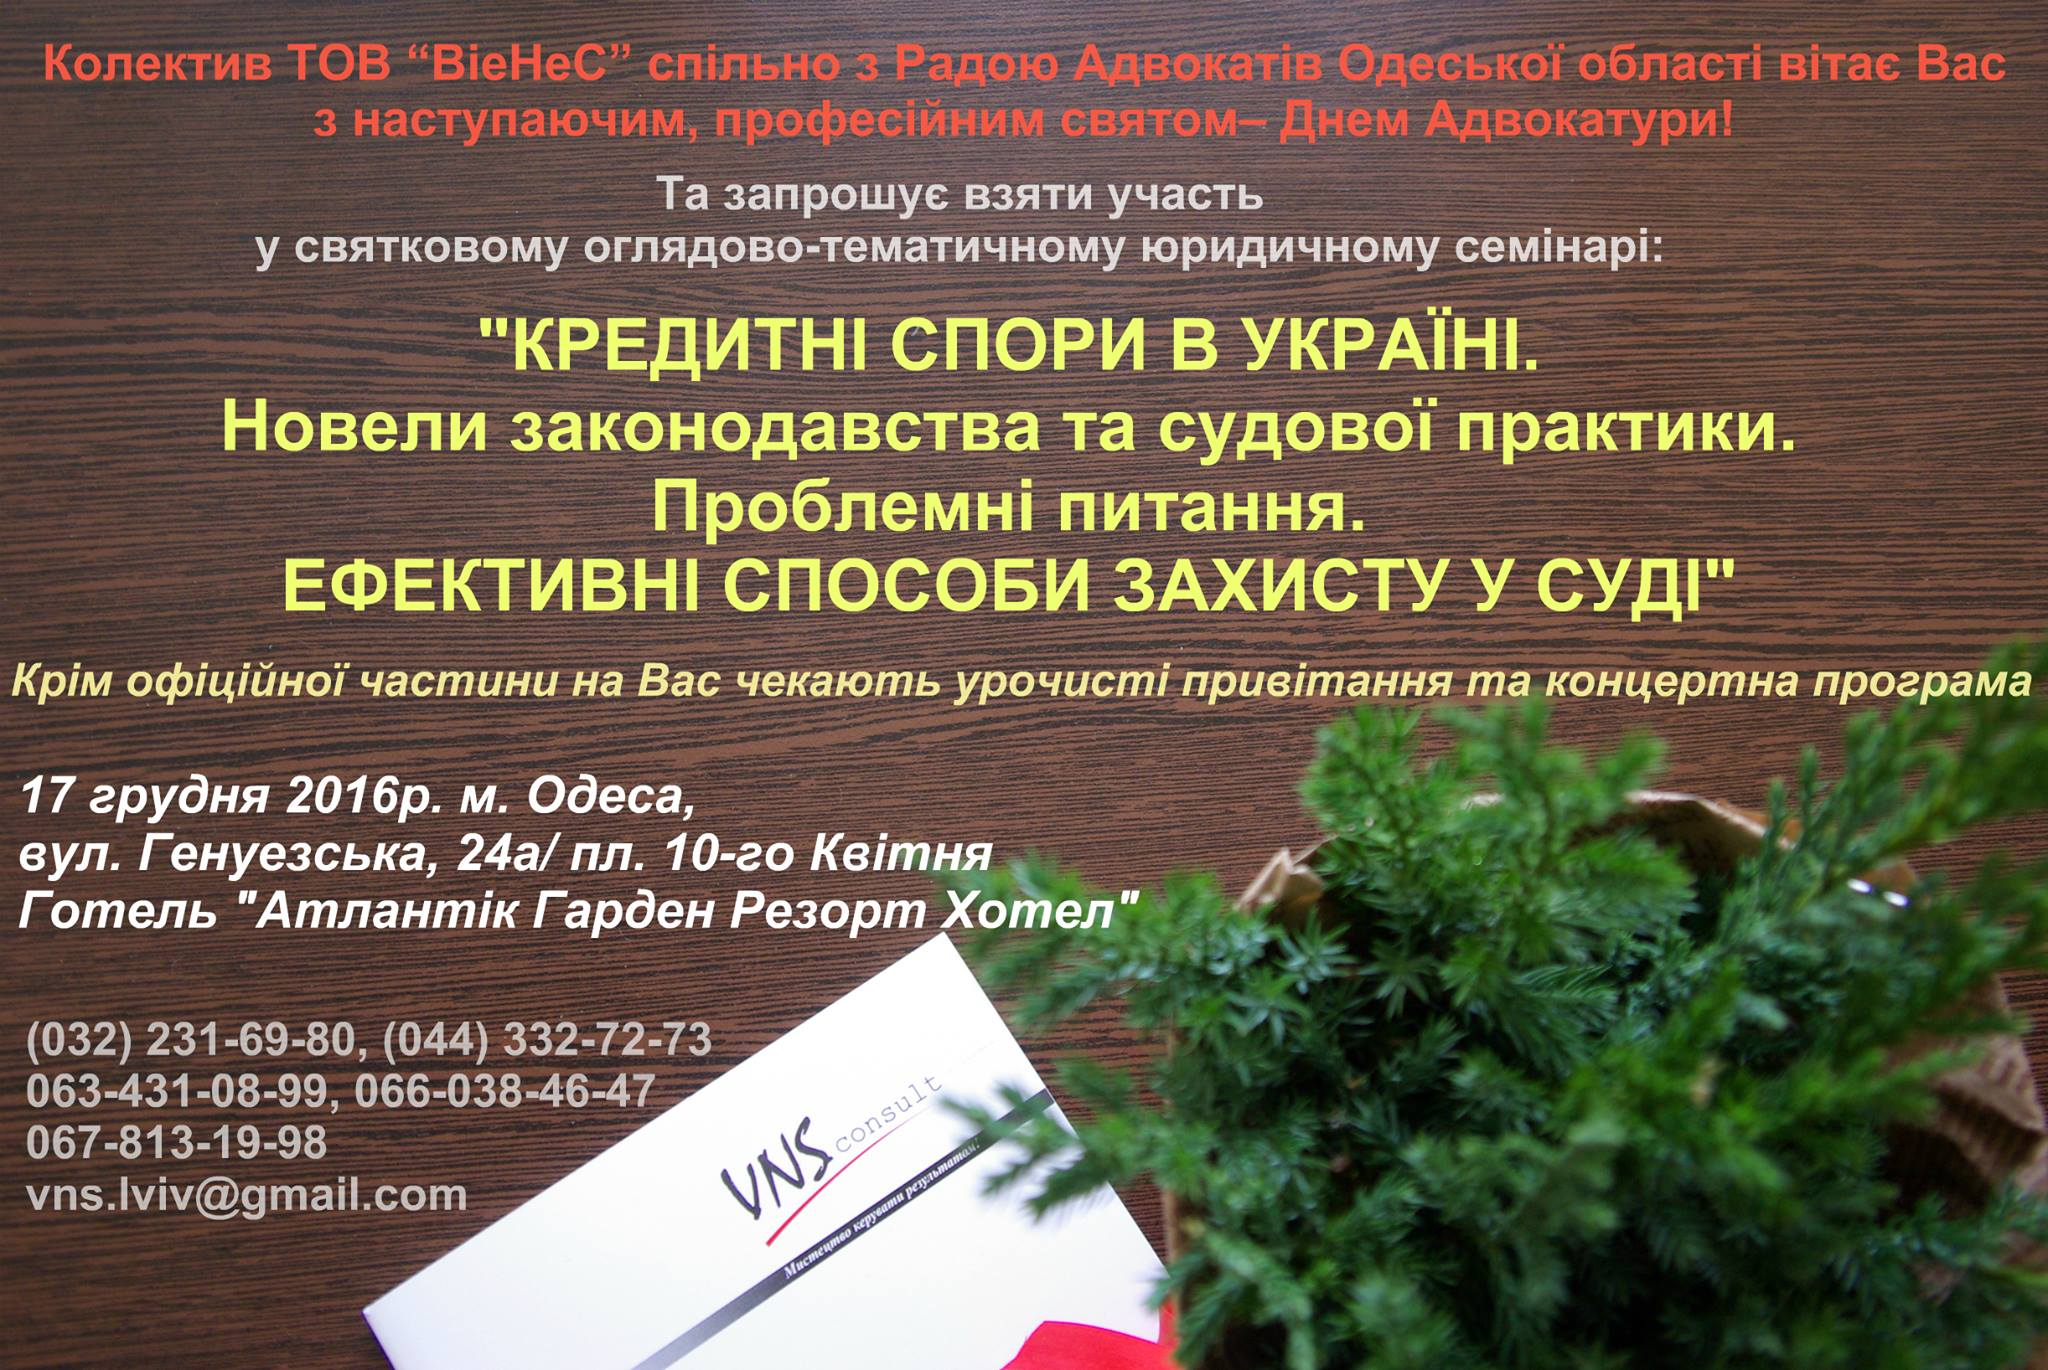 Сотрудниками компании «Гранд Иншур» проведён семинар в г. Одессе о кредитных спорах